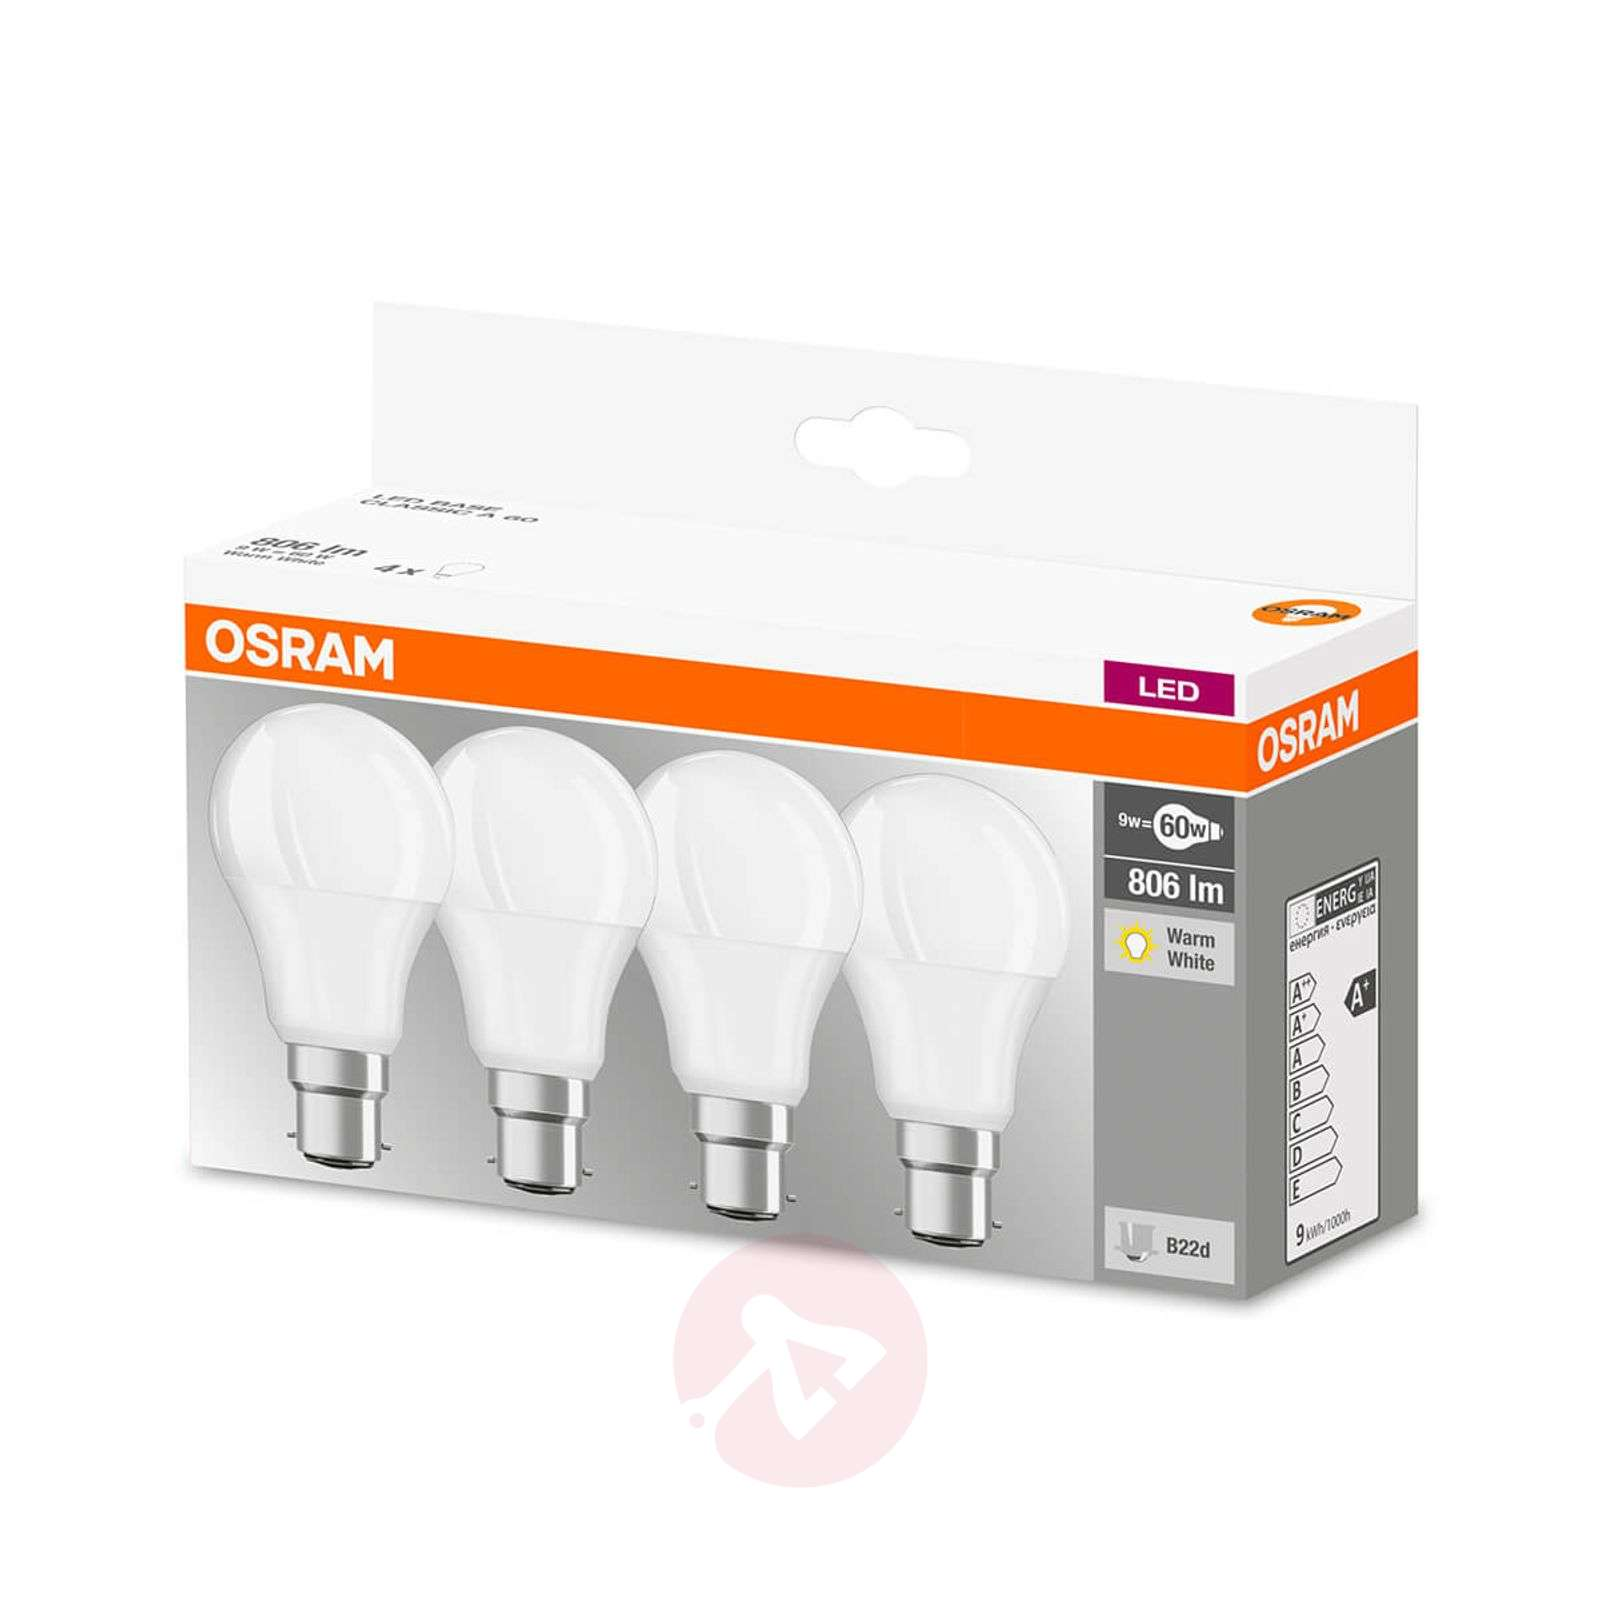 LED bulb B22d 9W, warm white, 806 lumens, set of 4-7262107-01